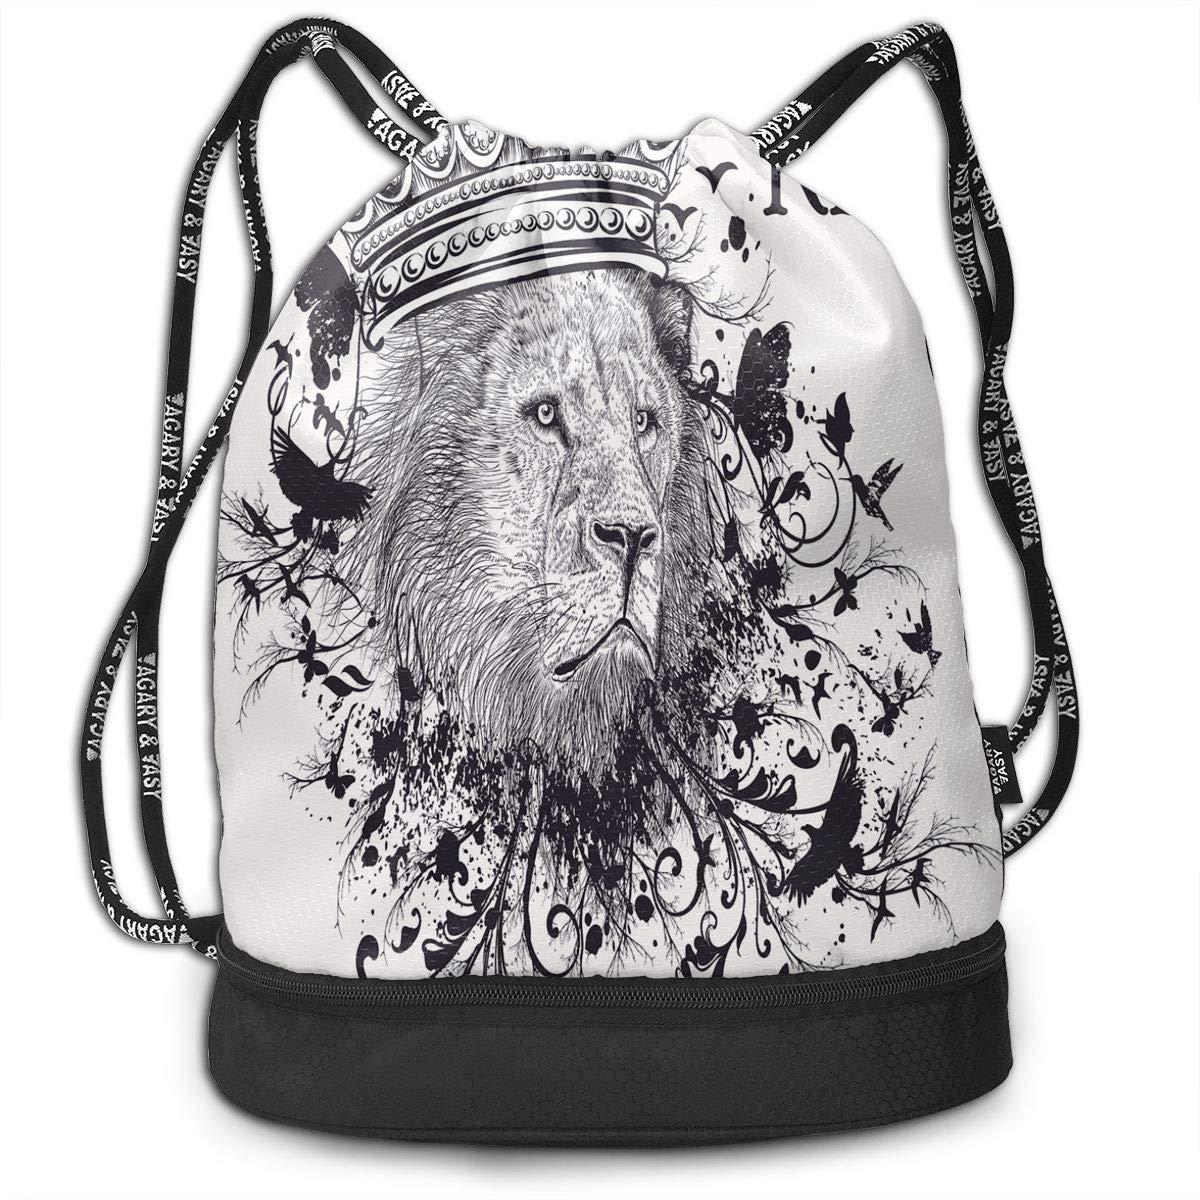 Reign Drawstring Bag